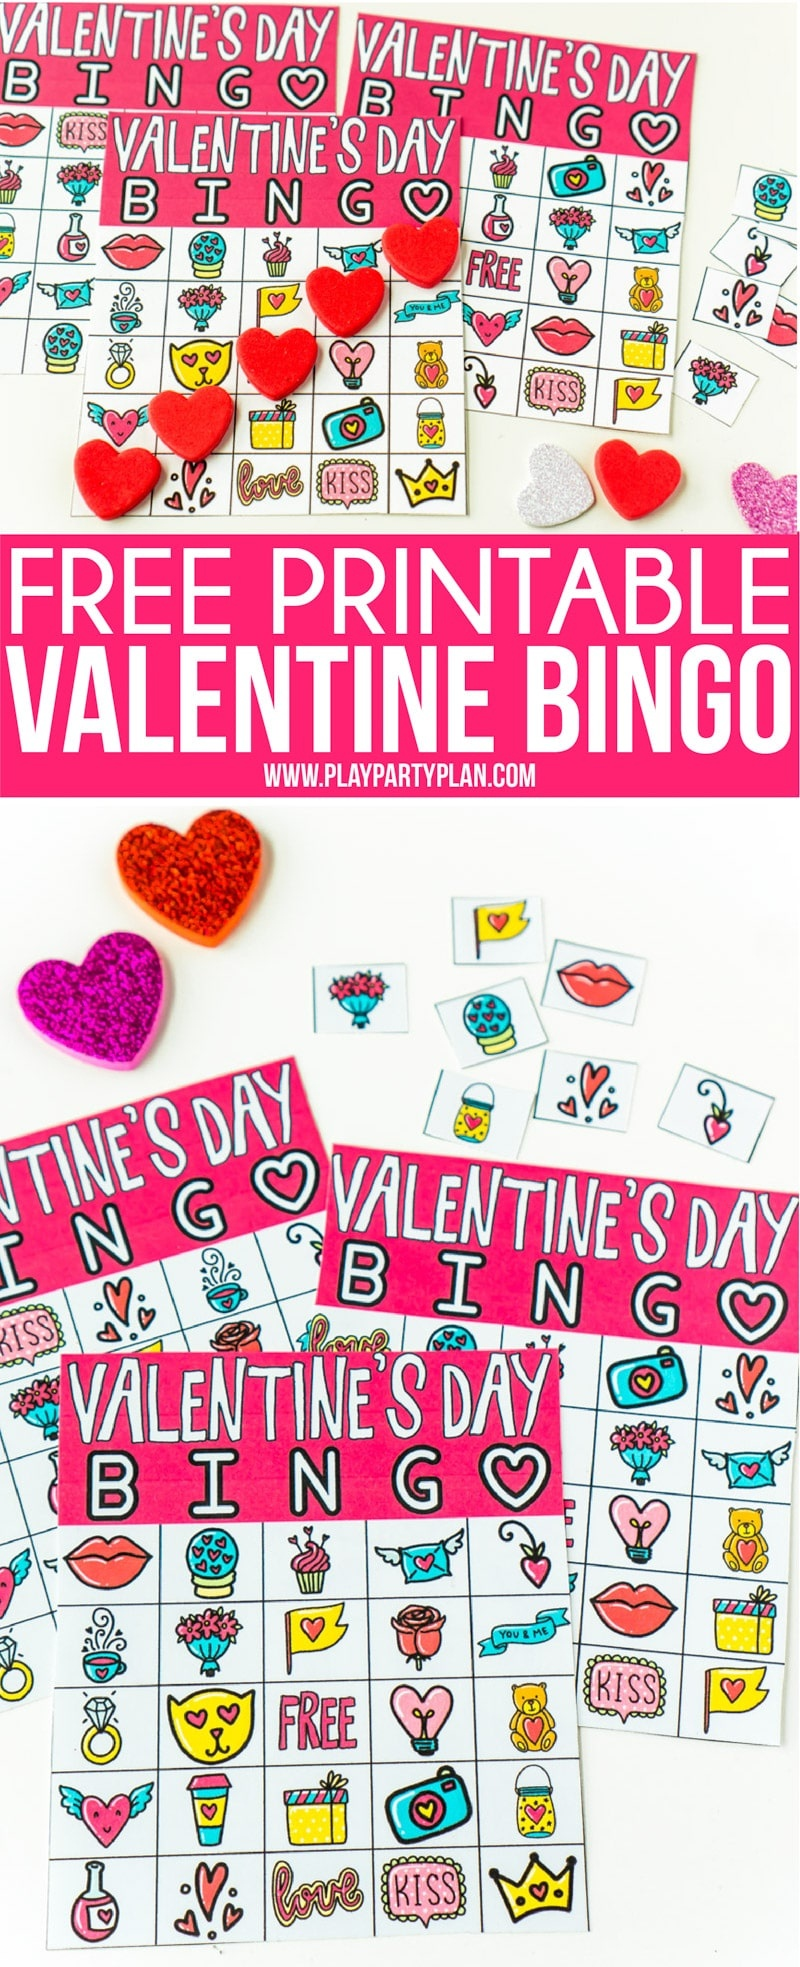 Free Printable Valentine Bingo Cards For All Ages - Play Party Plan - Valentine Bingo Game Printable Free